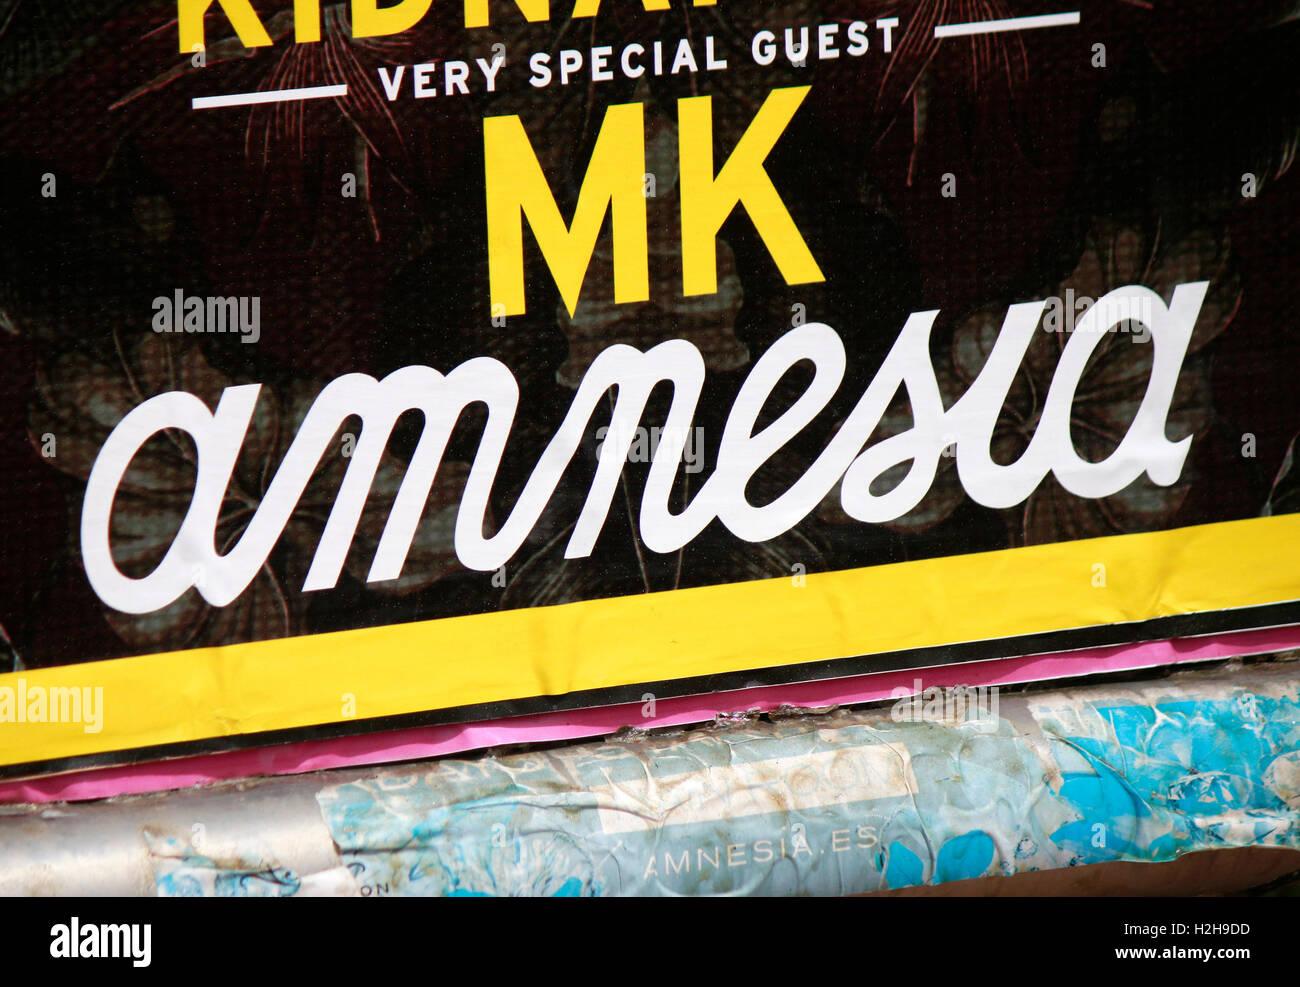 das Logo der Marke 'Amnesia', Ibiza, Spanien. - Stock Image